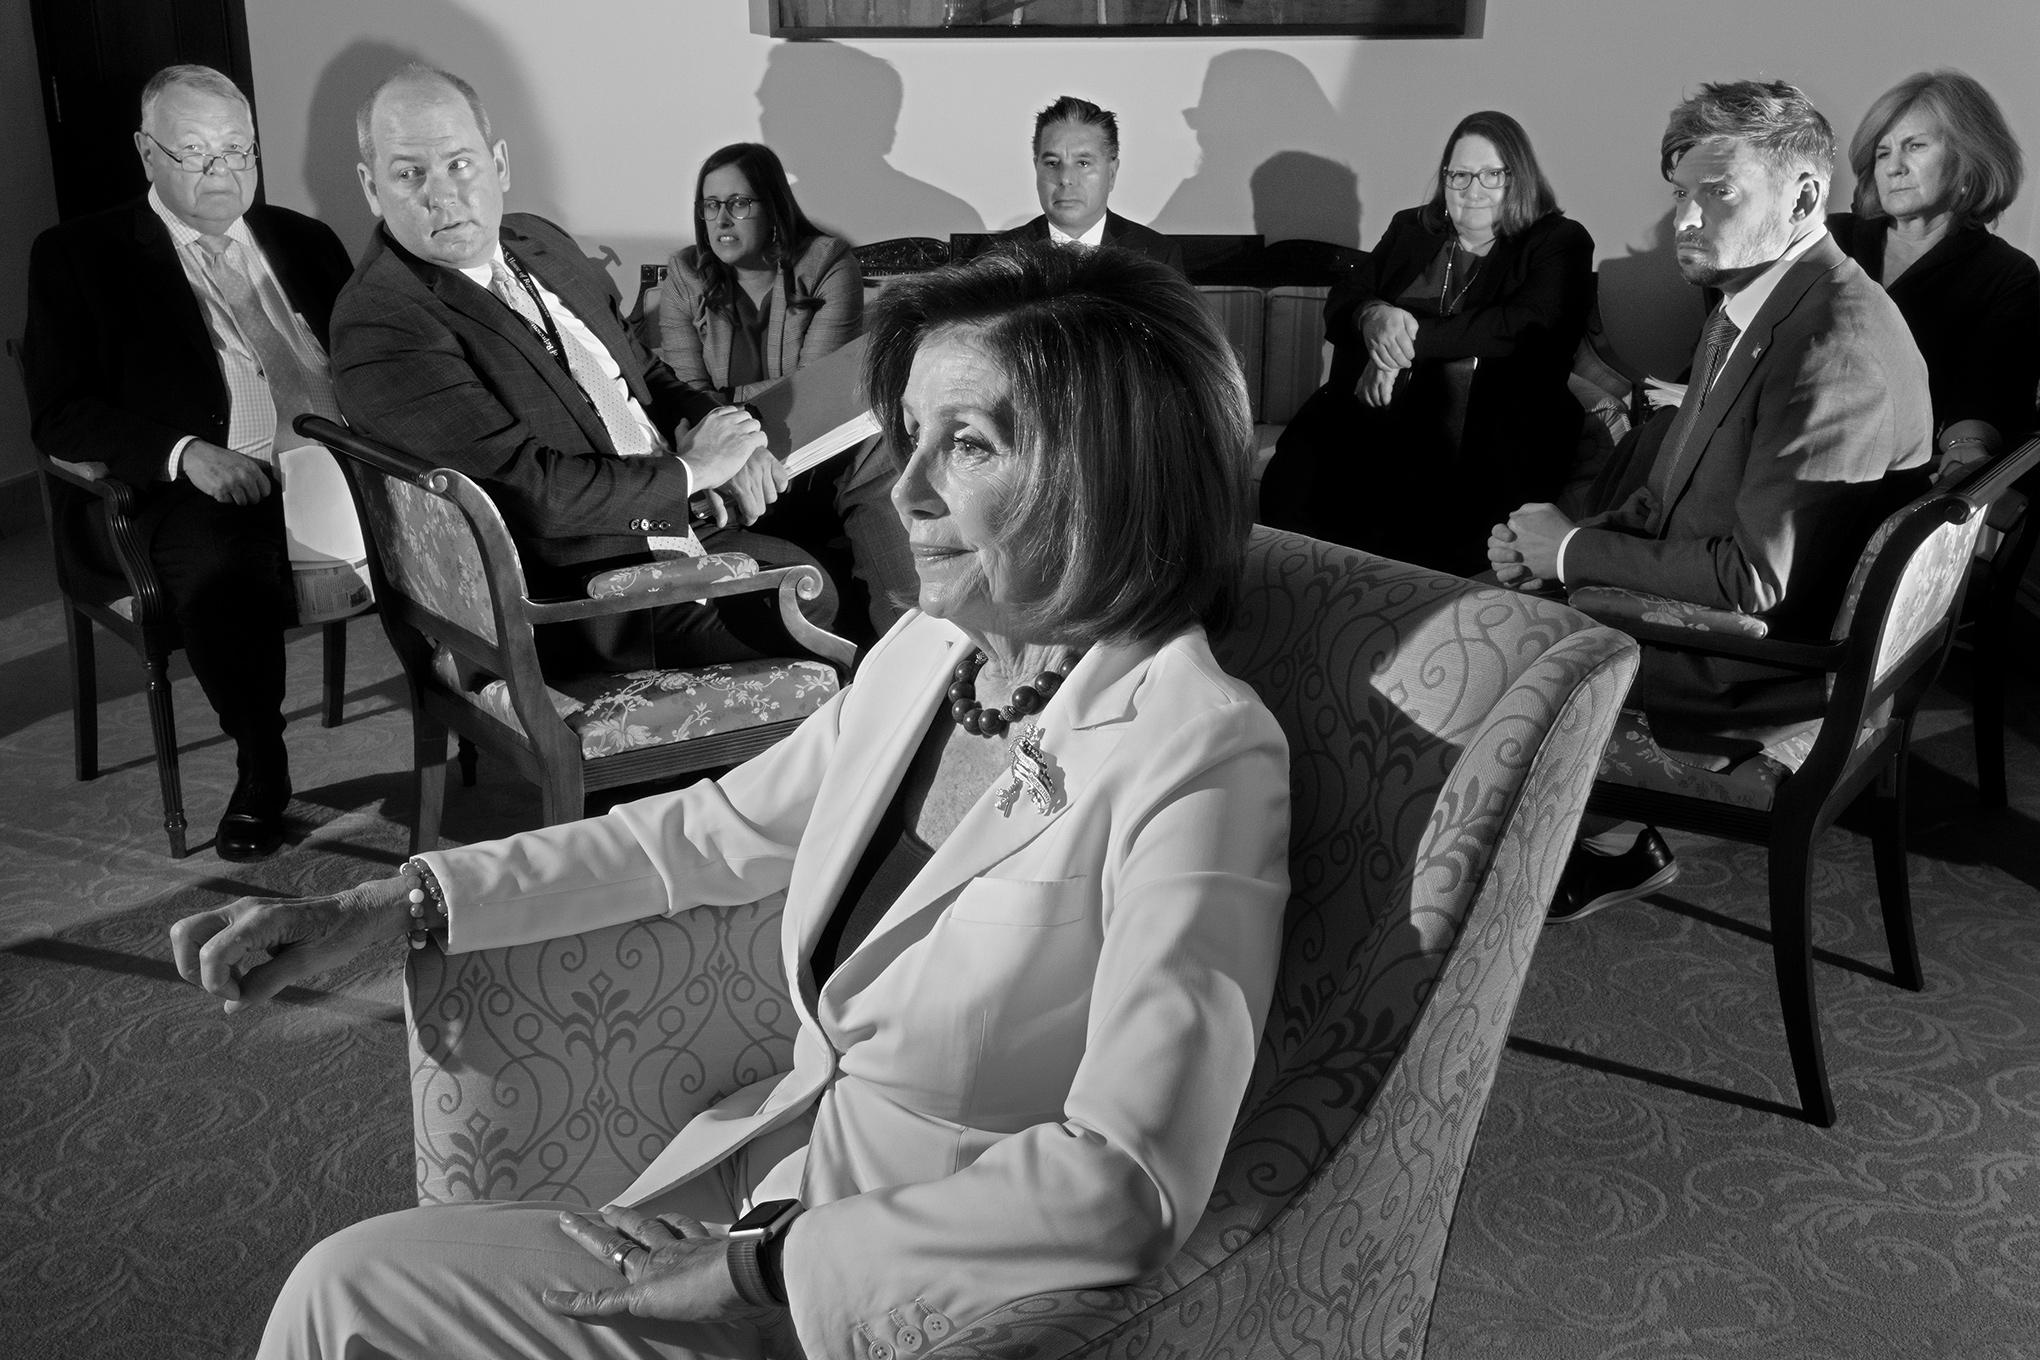 speaker nancy pelosi trump impeachment 08 jpg?quality=85.'